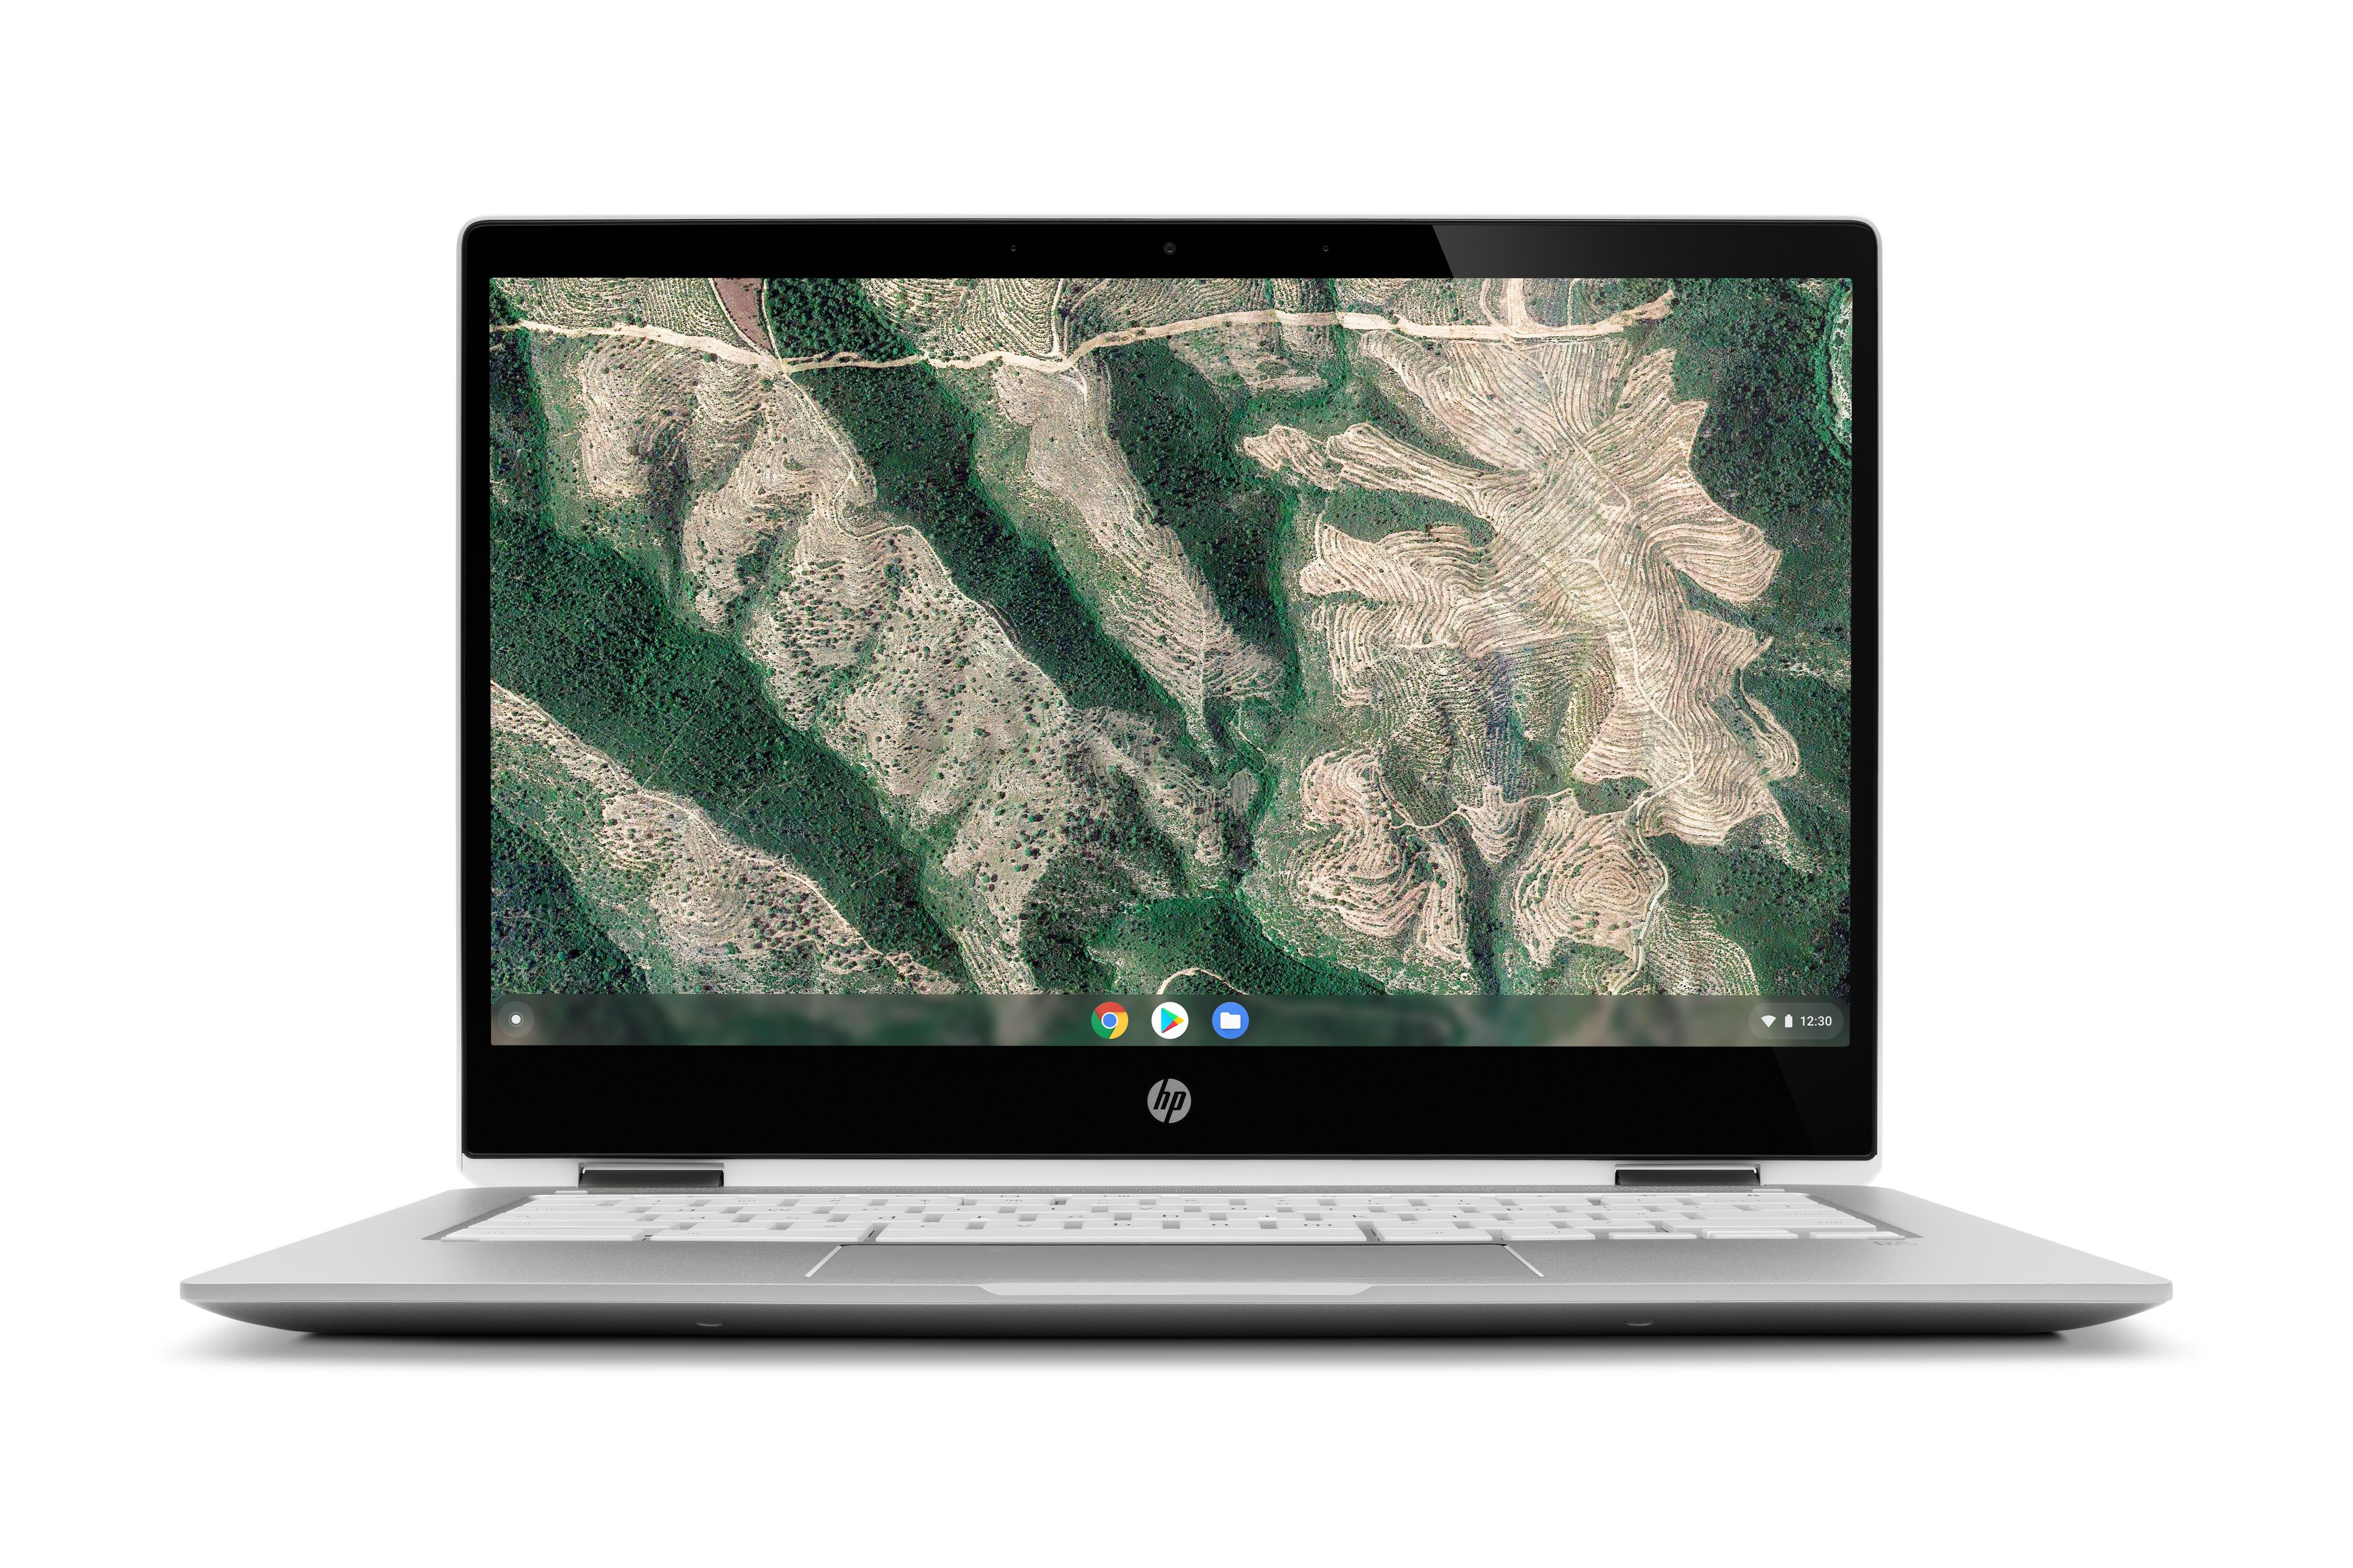 1_HP Chromebook x360 14b_Conv 14_2019_OFL_5490x3360_LSS_Final